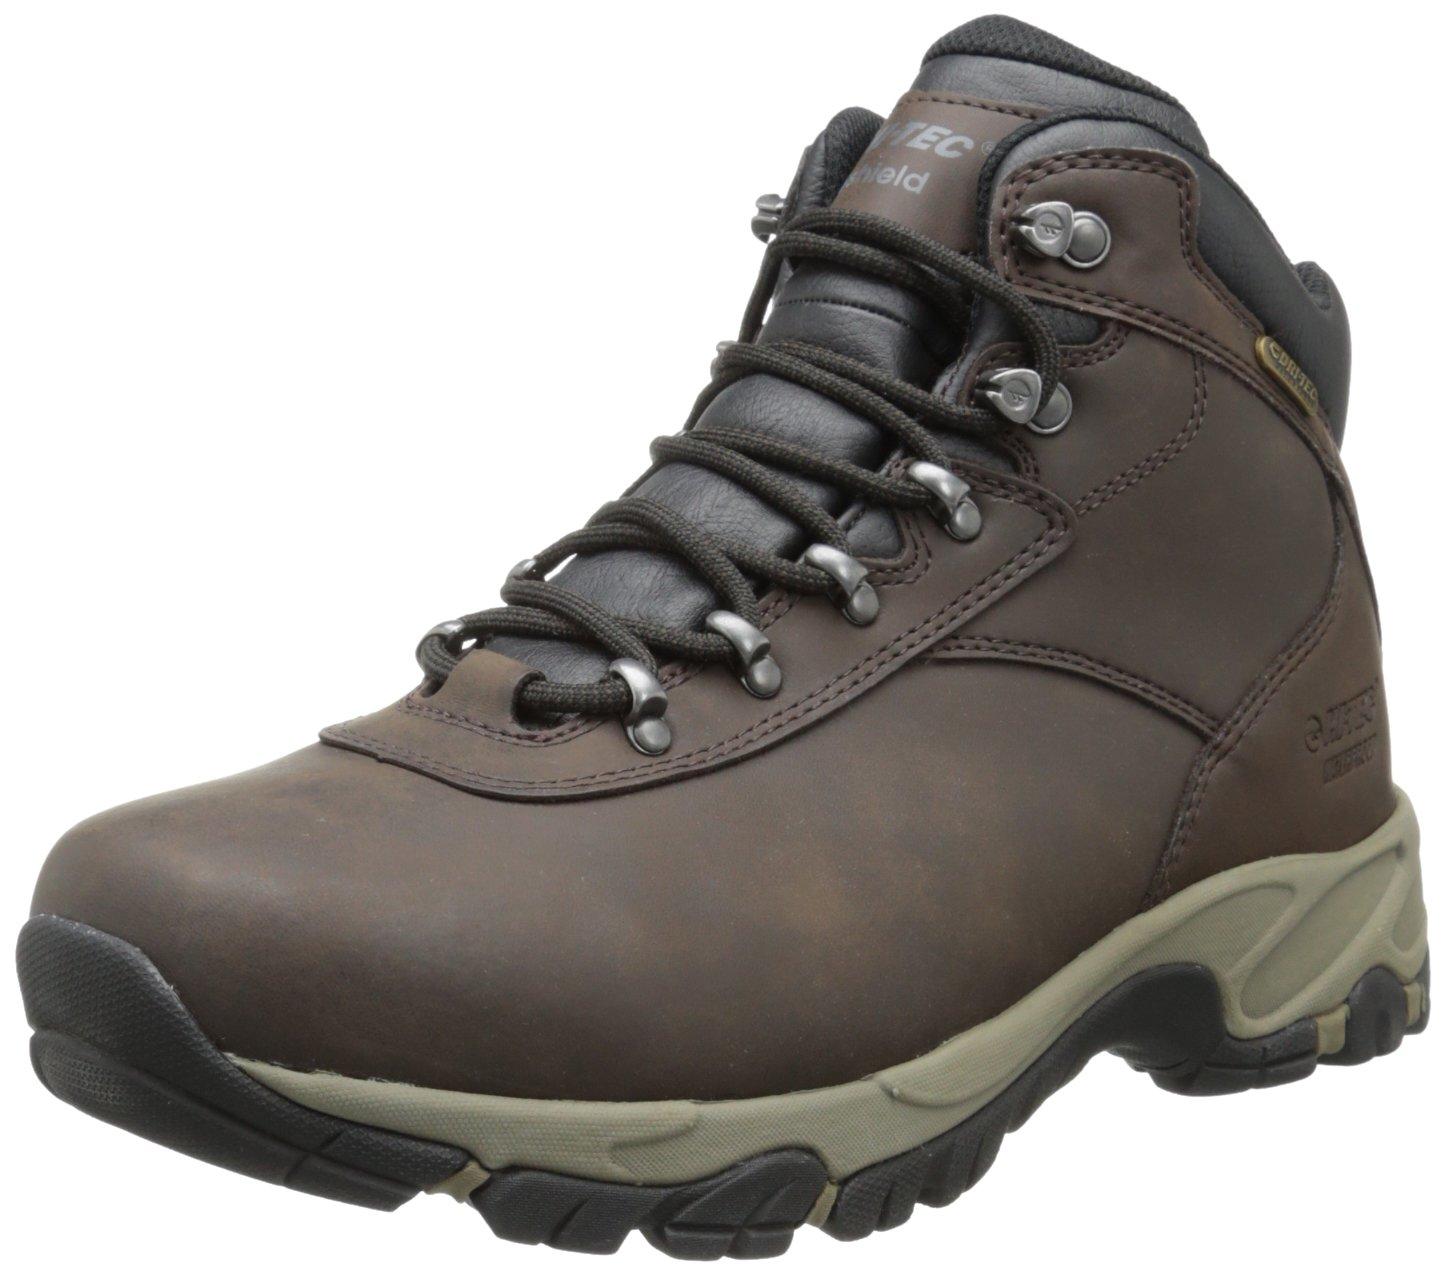 Hi-Tec Men's Altitude V I Waterproof Hiking Boot,Dark Chocolate/Dark Taupe/Black,10 M US